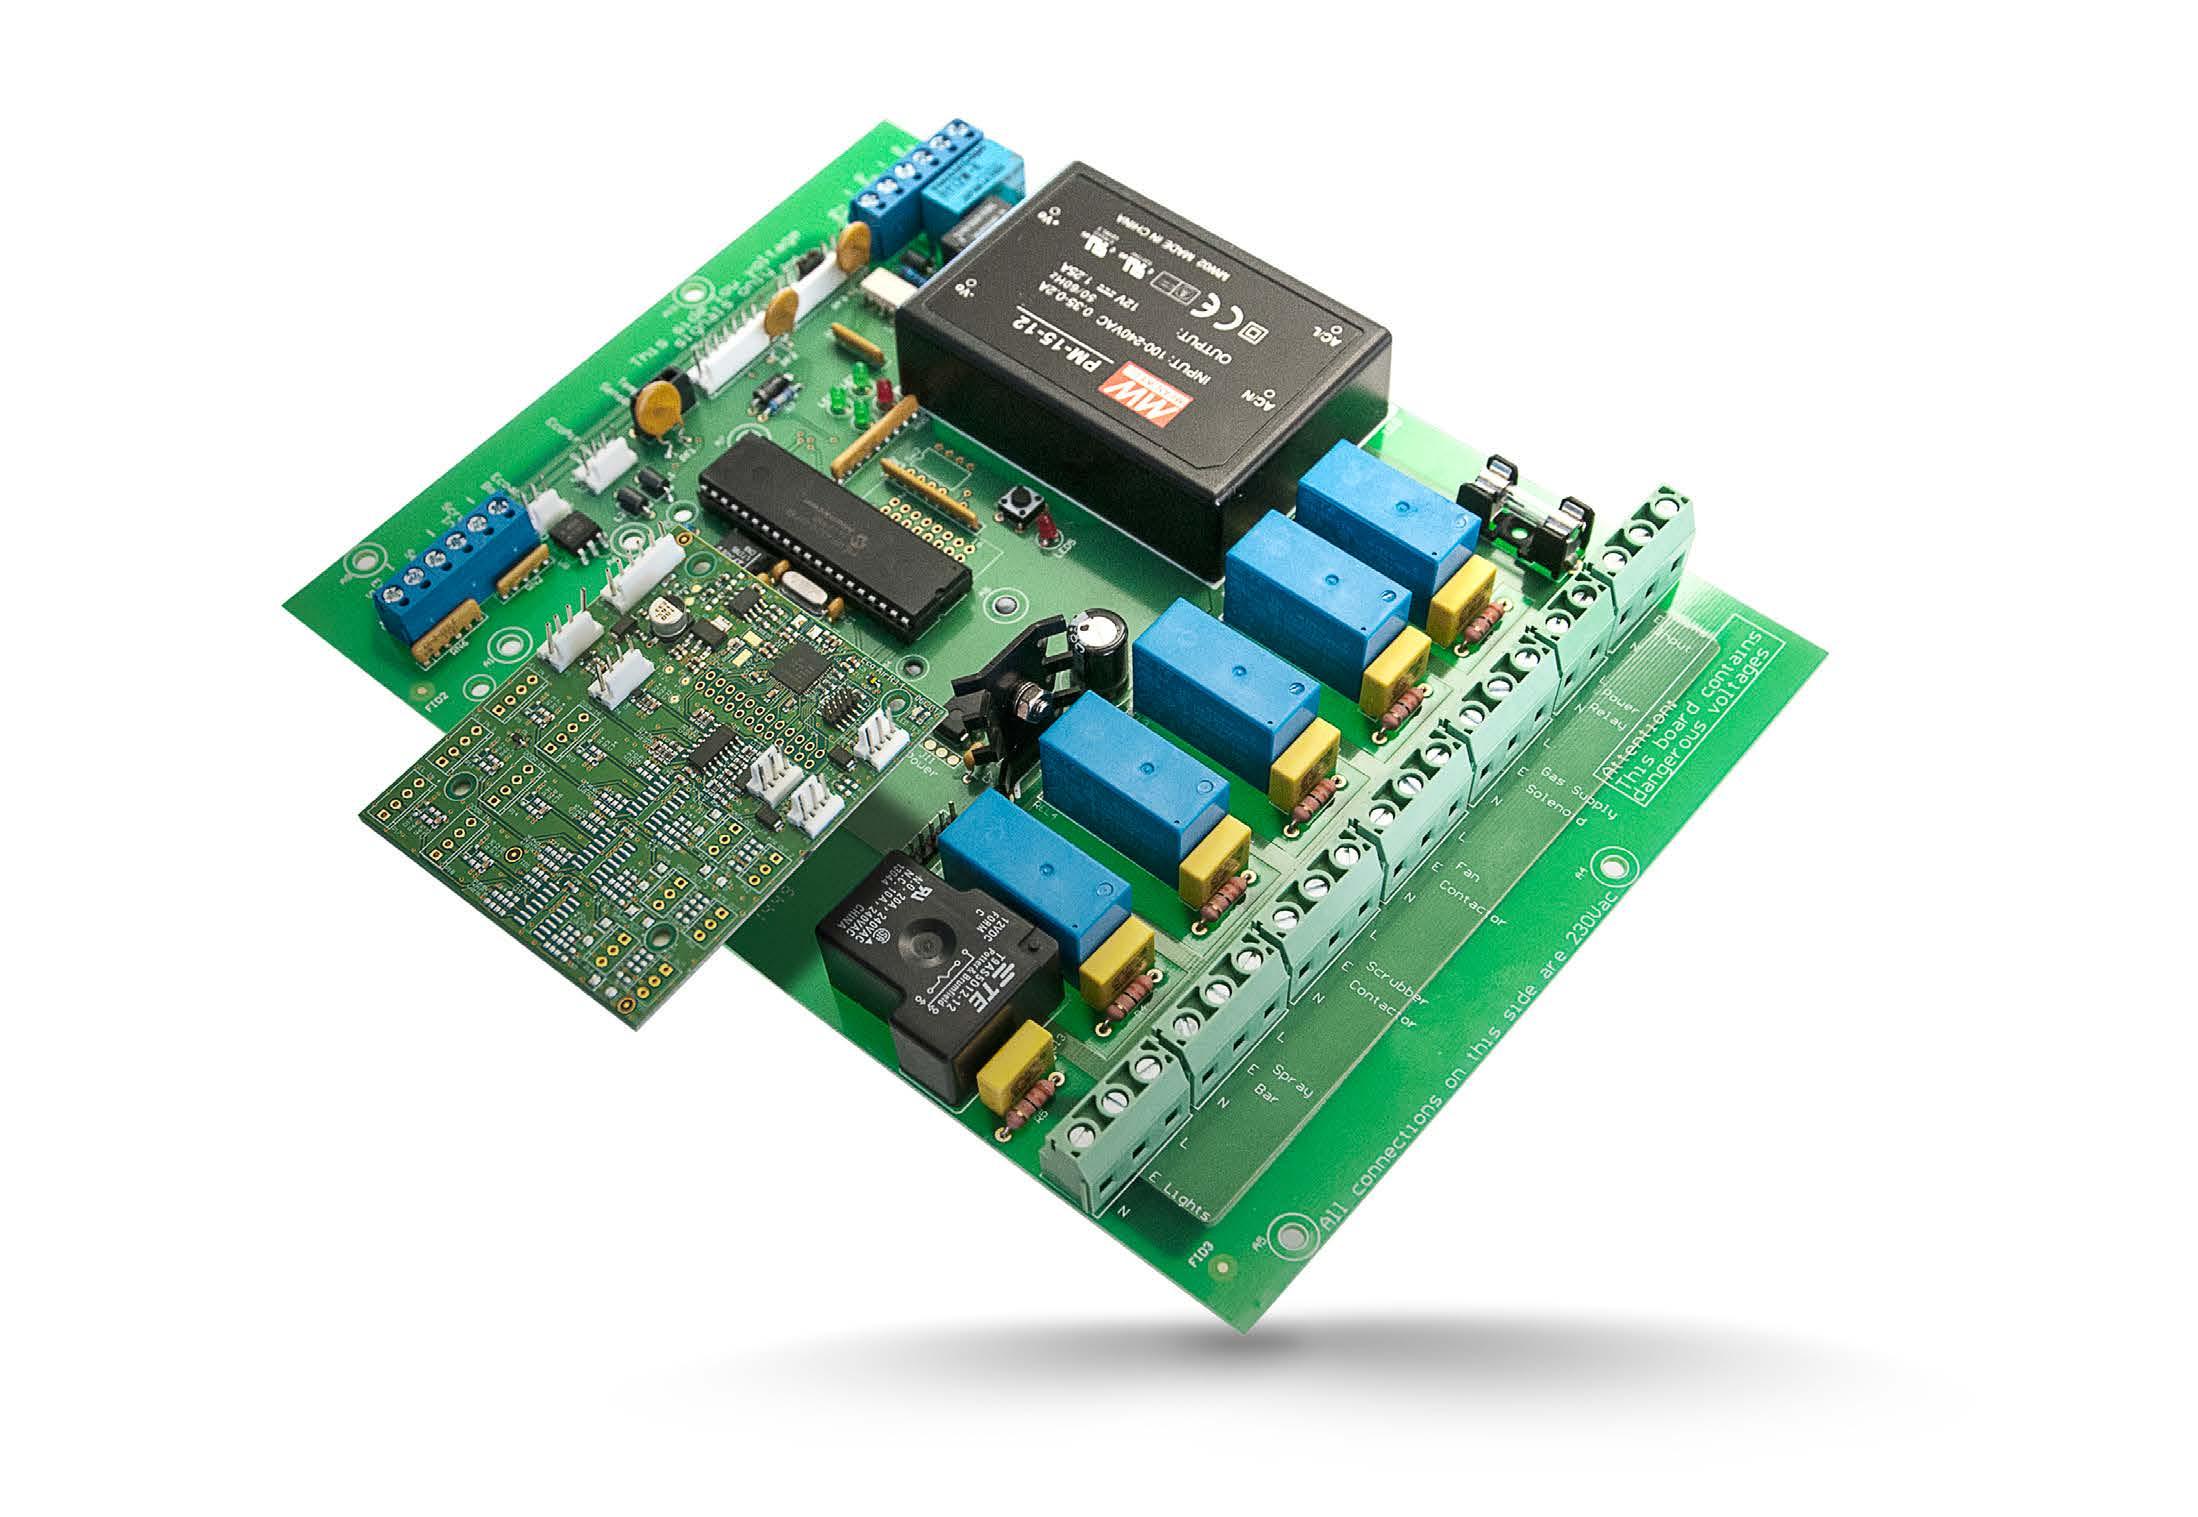 EcoAirlll VAV Fume Cupboard controller